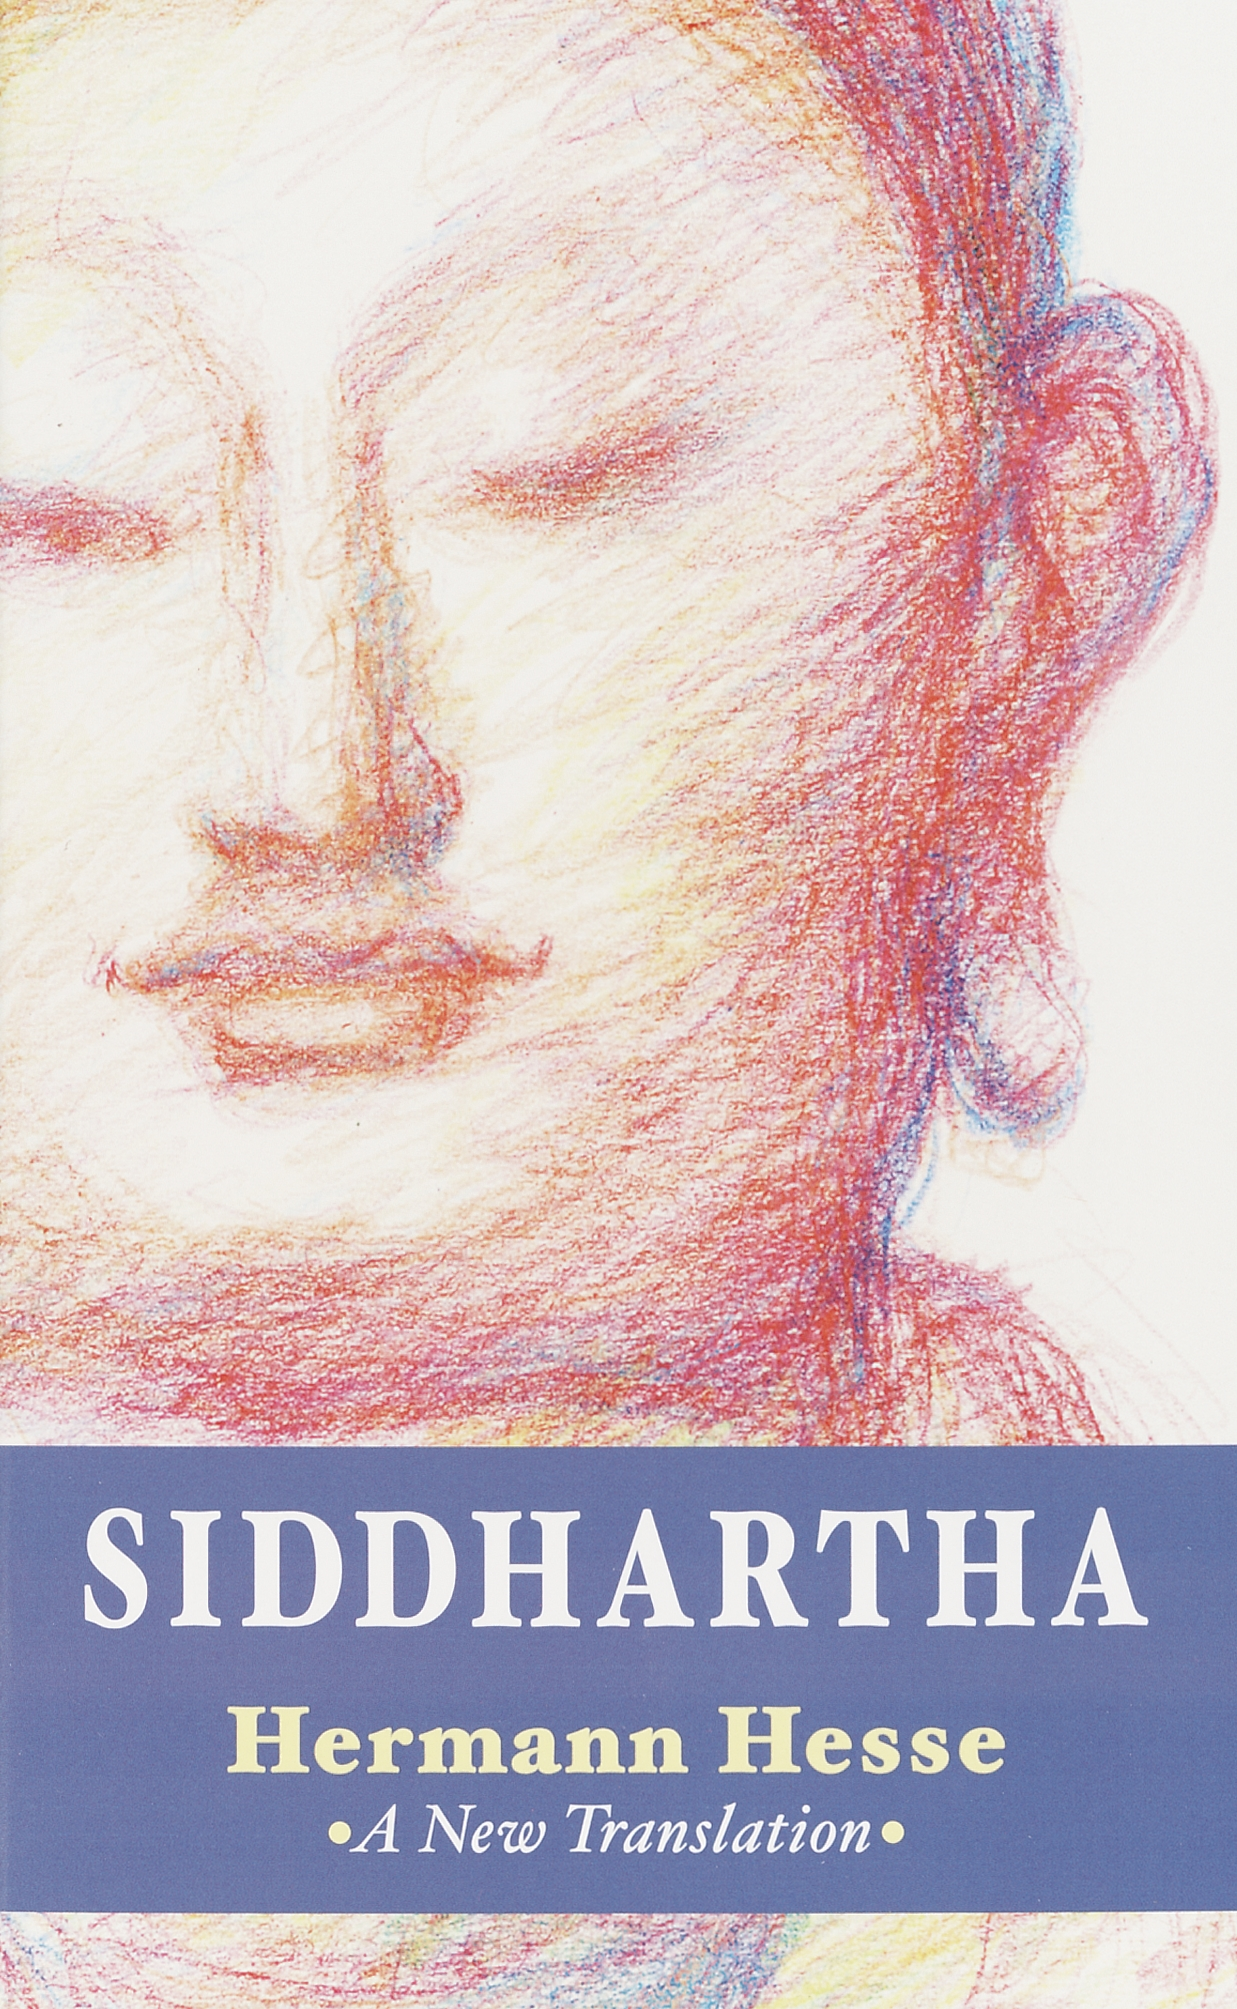 the philosophy in a novel siddhartha about a life of a man named siddhartha Named vasudeva, agrees happily as siddhartha  siddhartha the mature man and siddhartha the old man  the river is like siddhartha himself, and the life.